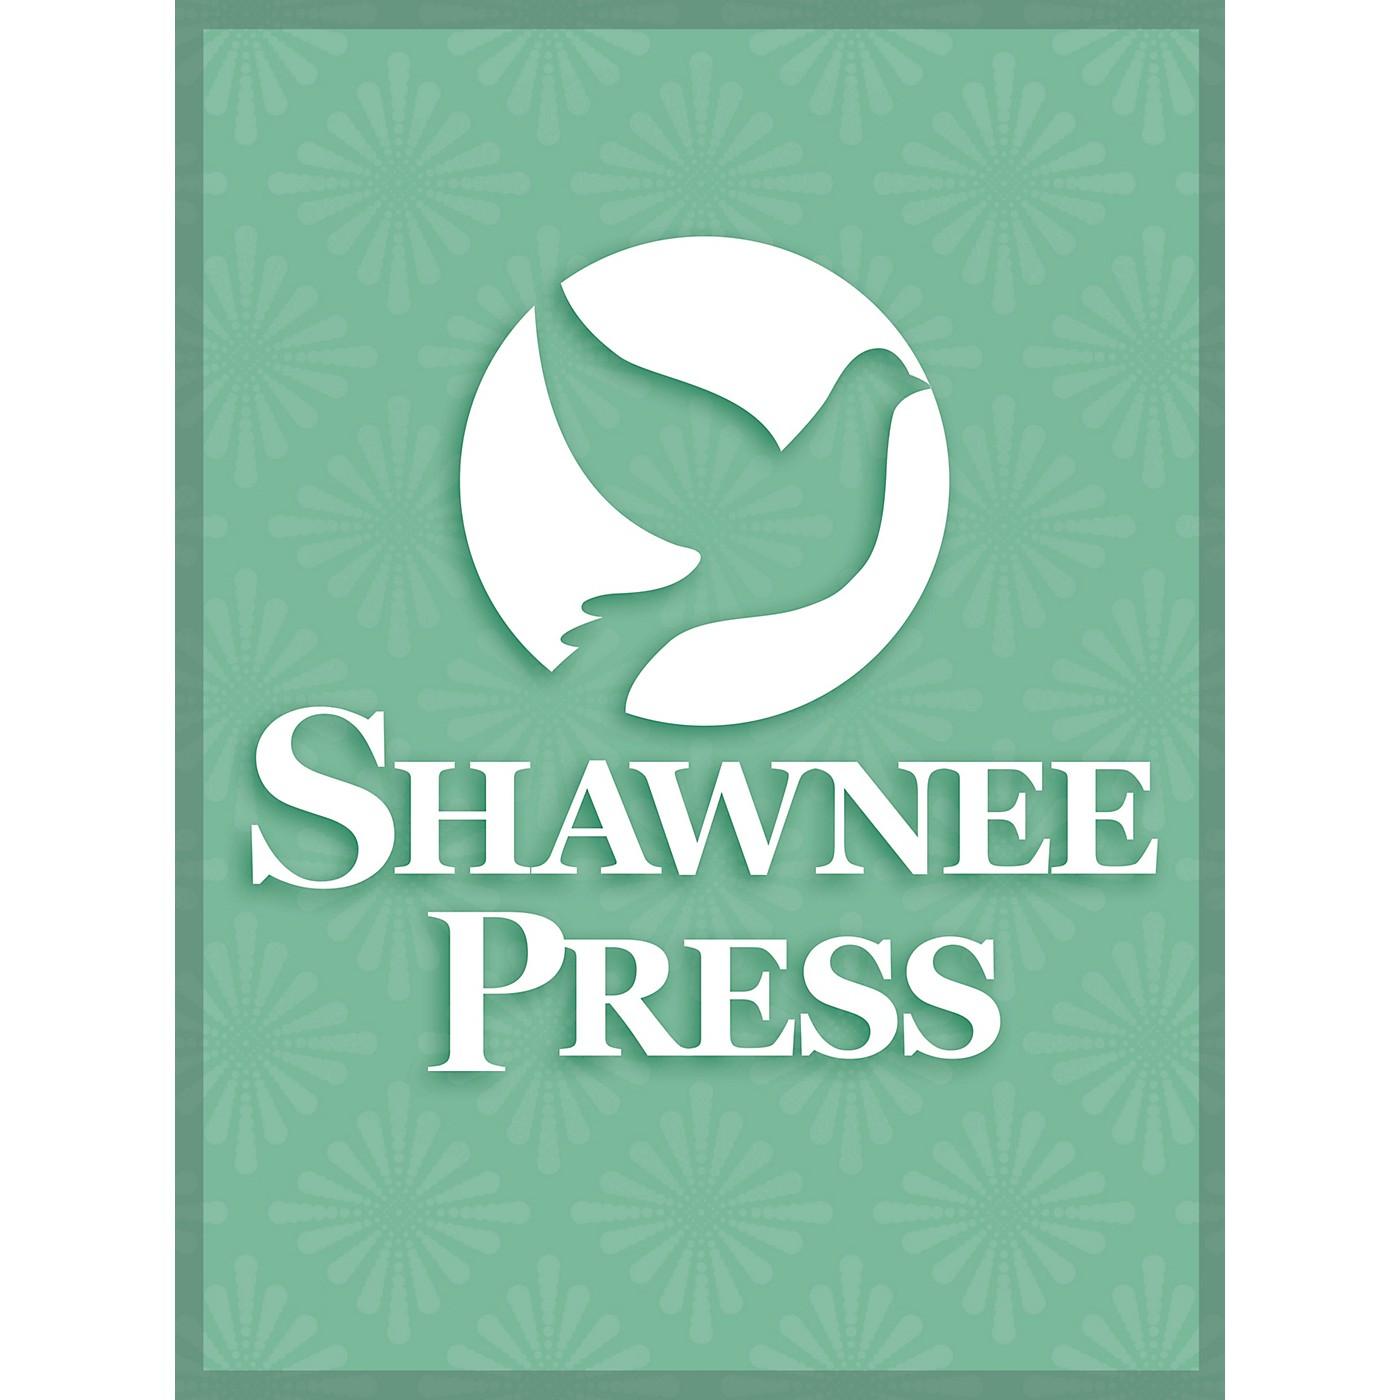 Shawnee Press Mistletoe SATB Arranged by Hawley Ades thumbnail